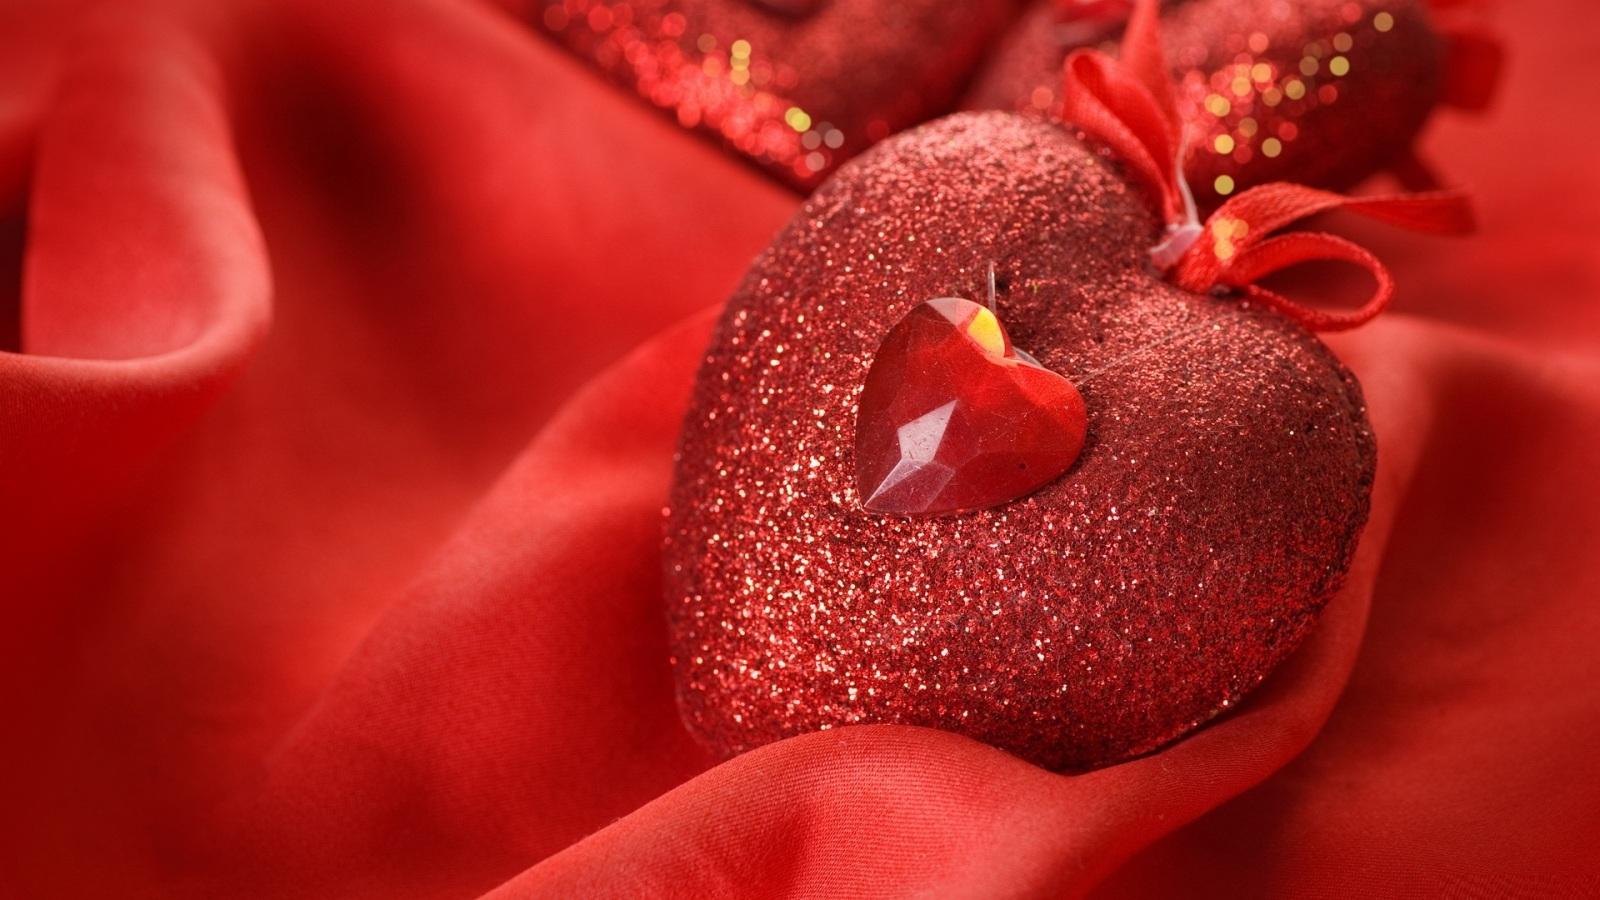 Images Of Love Download Free Hd Freehdimagesdownload Desktop Hd